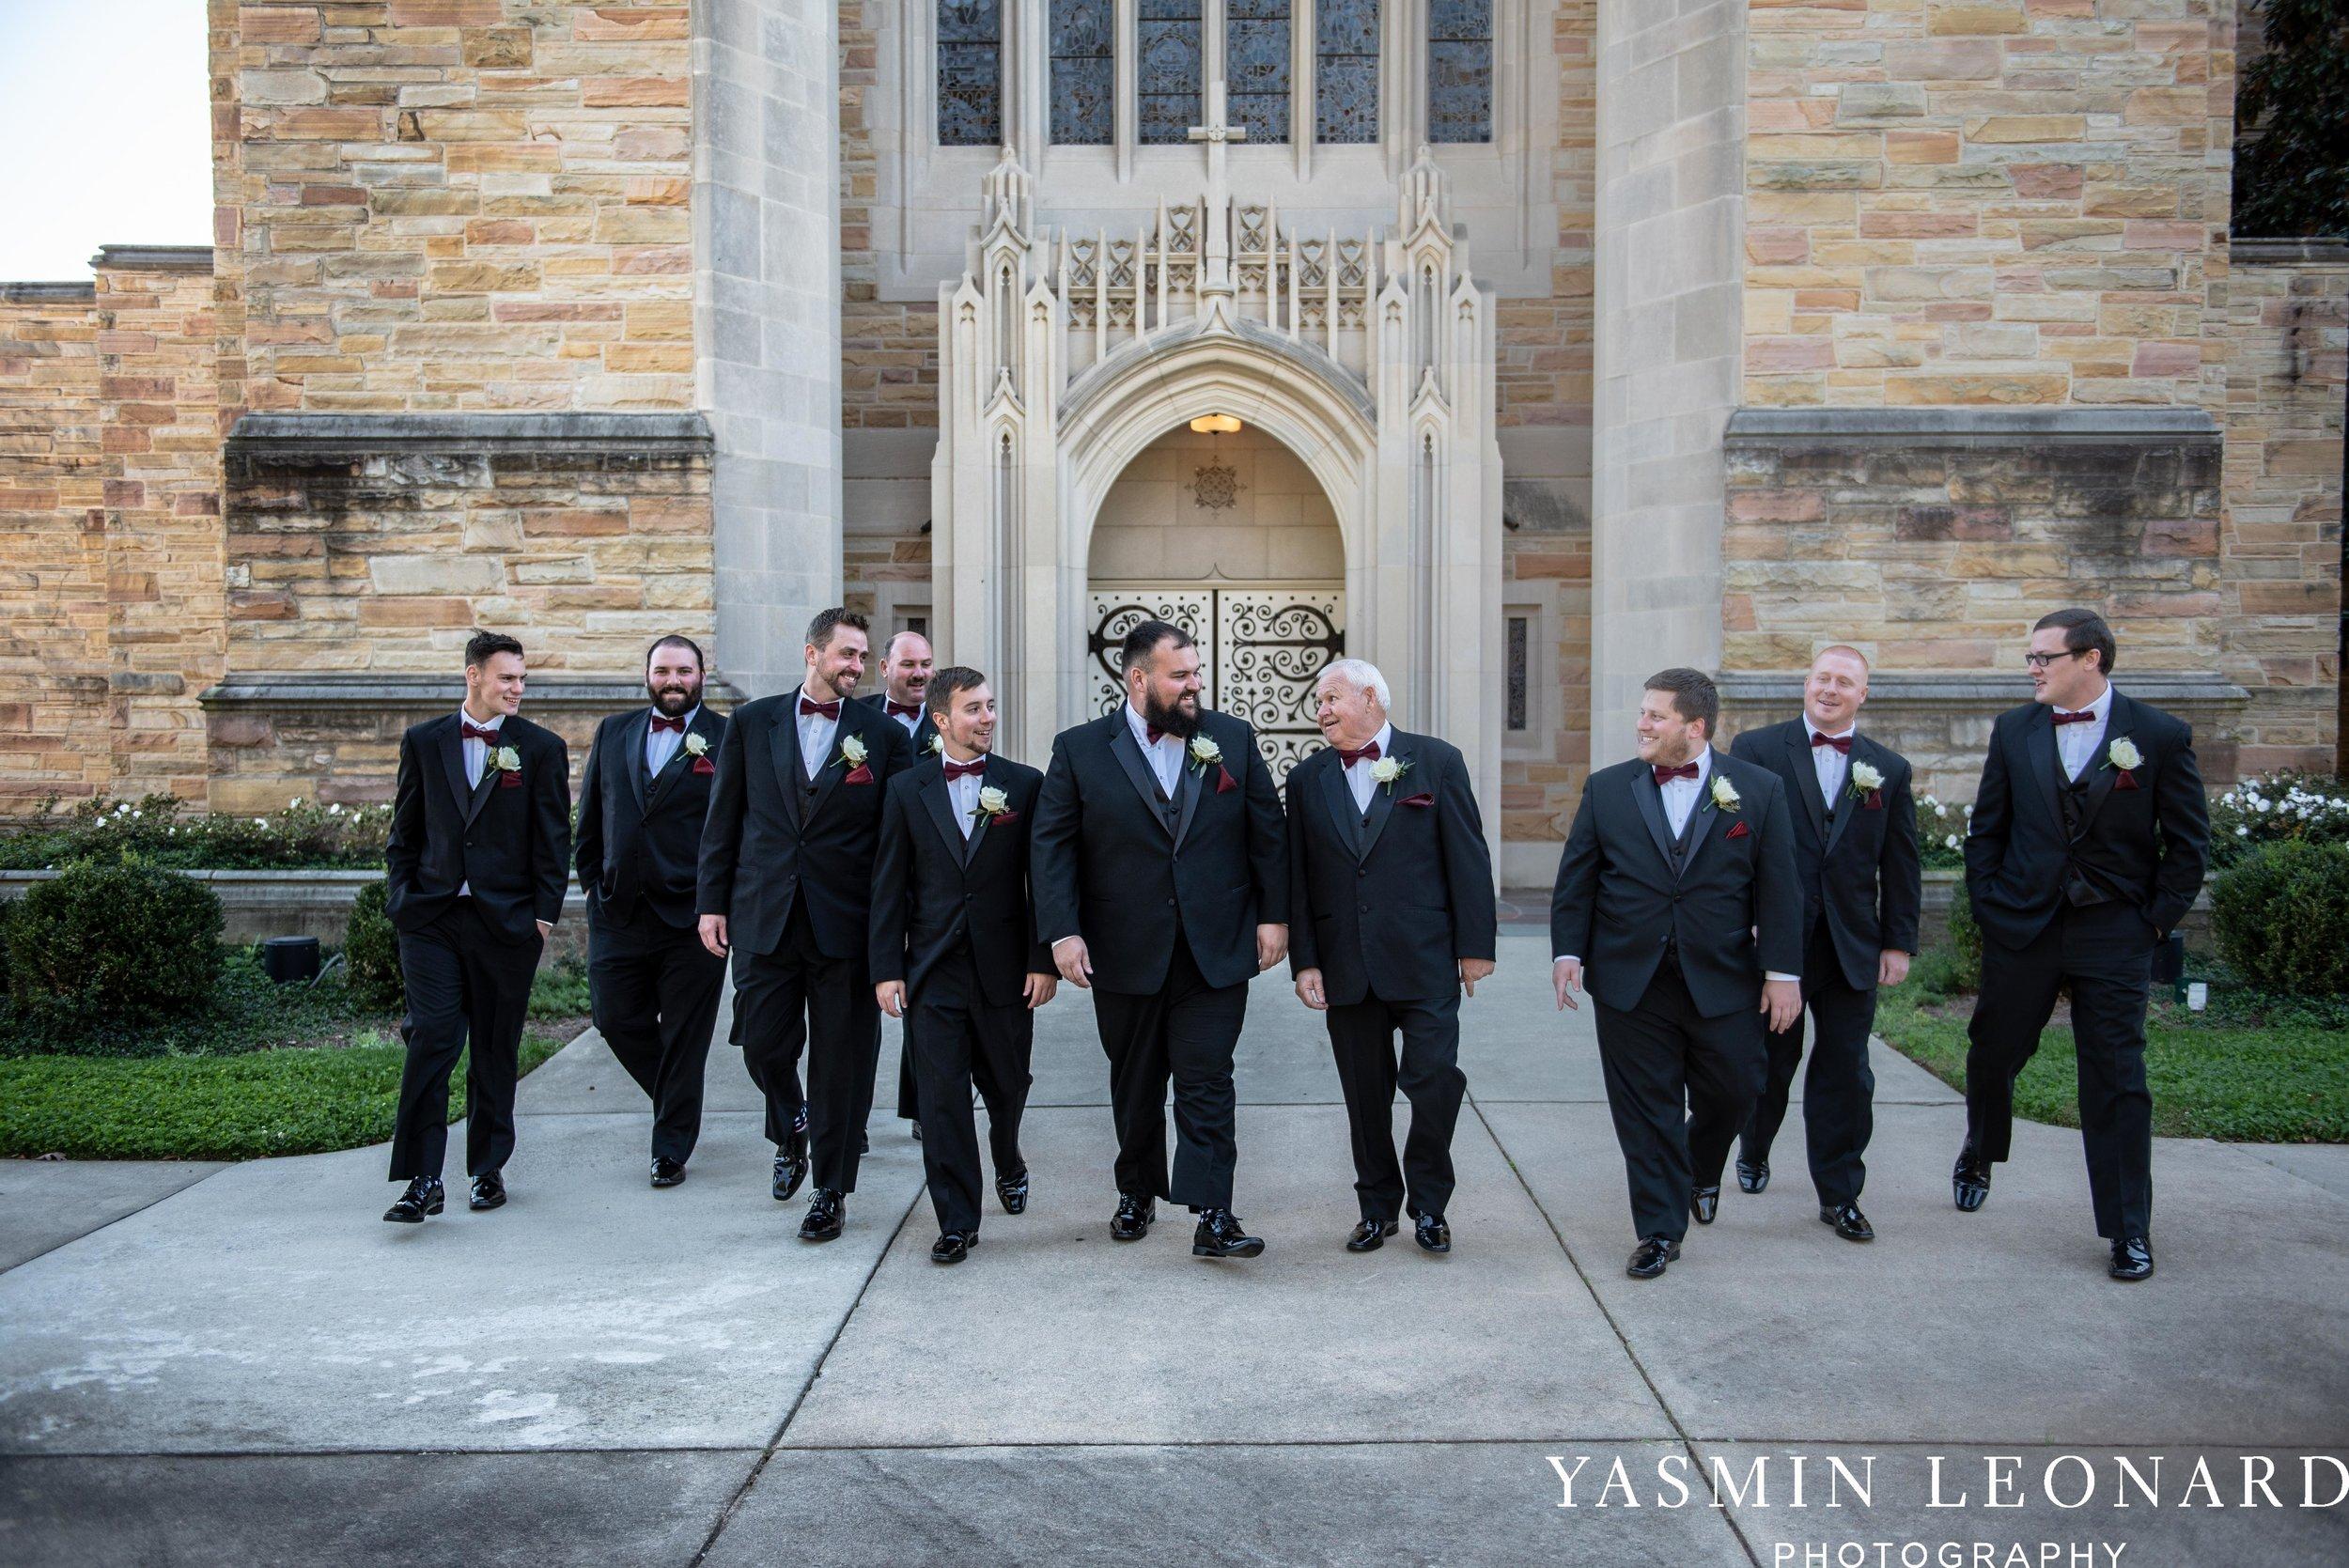 Wesley Memorial United Methodist Church - Old Homeplace Winery - High Point Weddings - High Point Wedding Photographer - NC Weddings - NC Barn Venue - Yasmin Leonard Photography-6.jpg